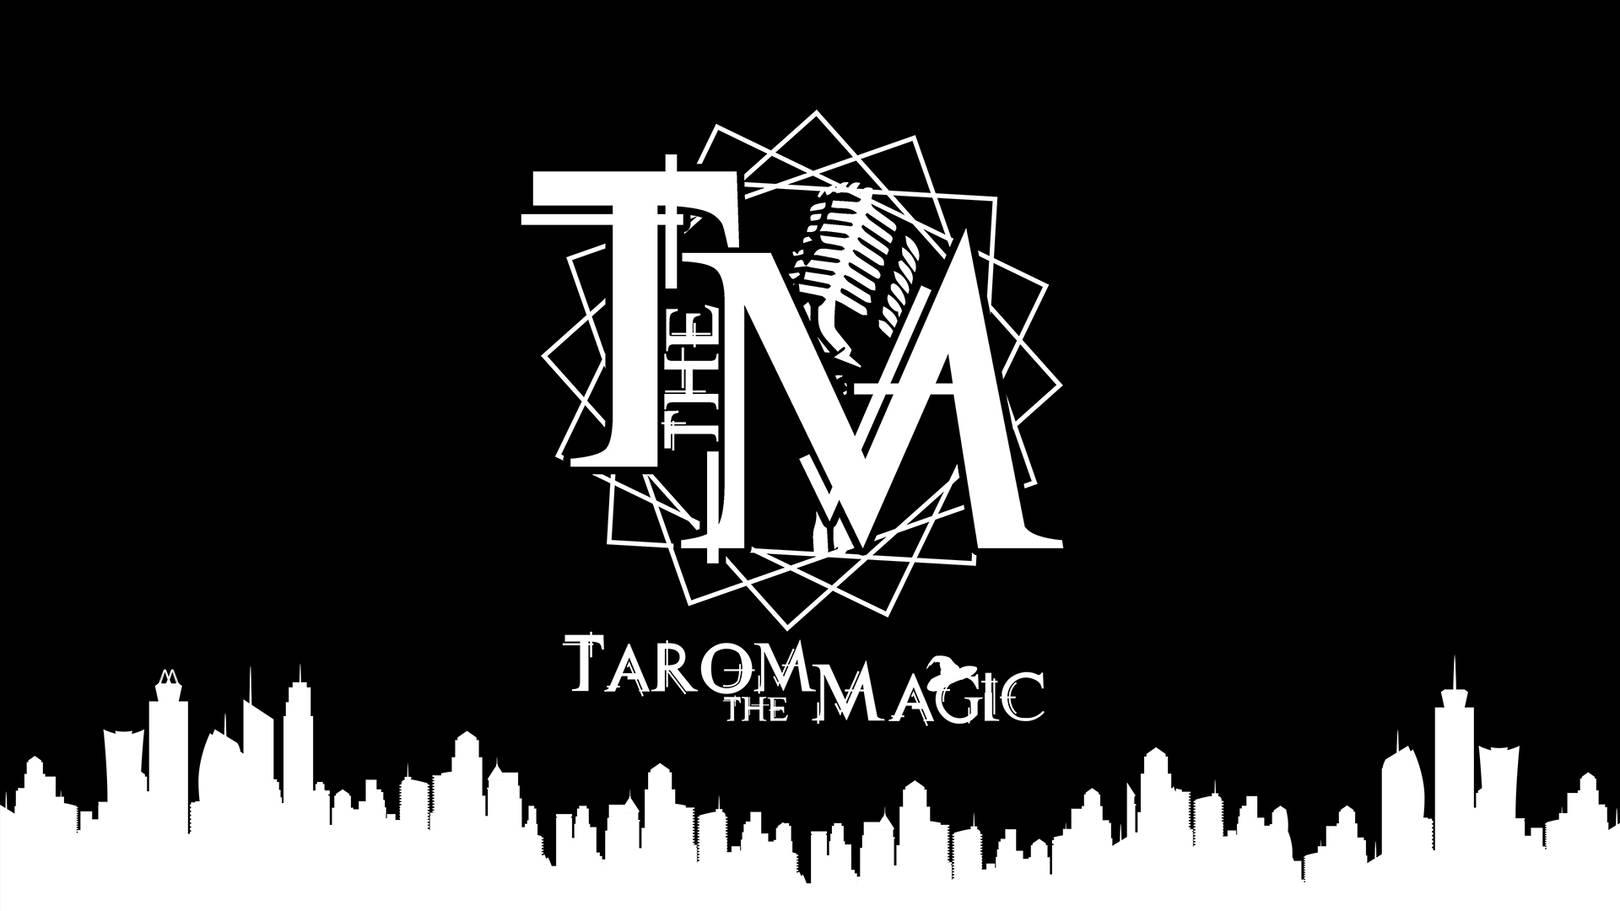 Логотип и обои для Tarom the Magic Софт: Adobe Illustrator CC 2015, Adobe Photoshop CC 2014